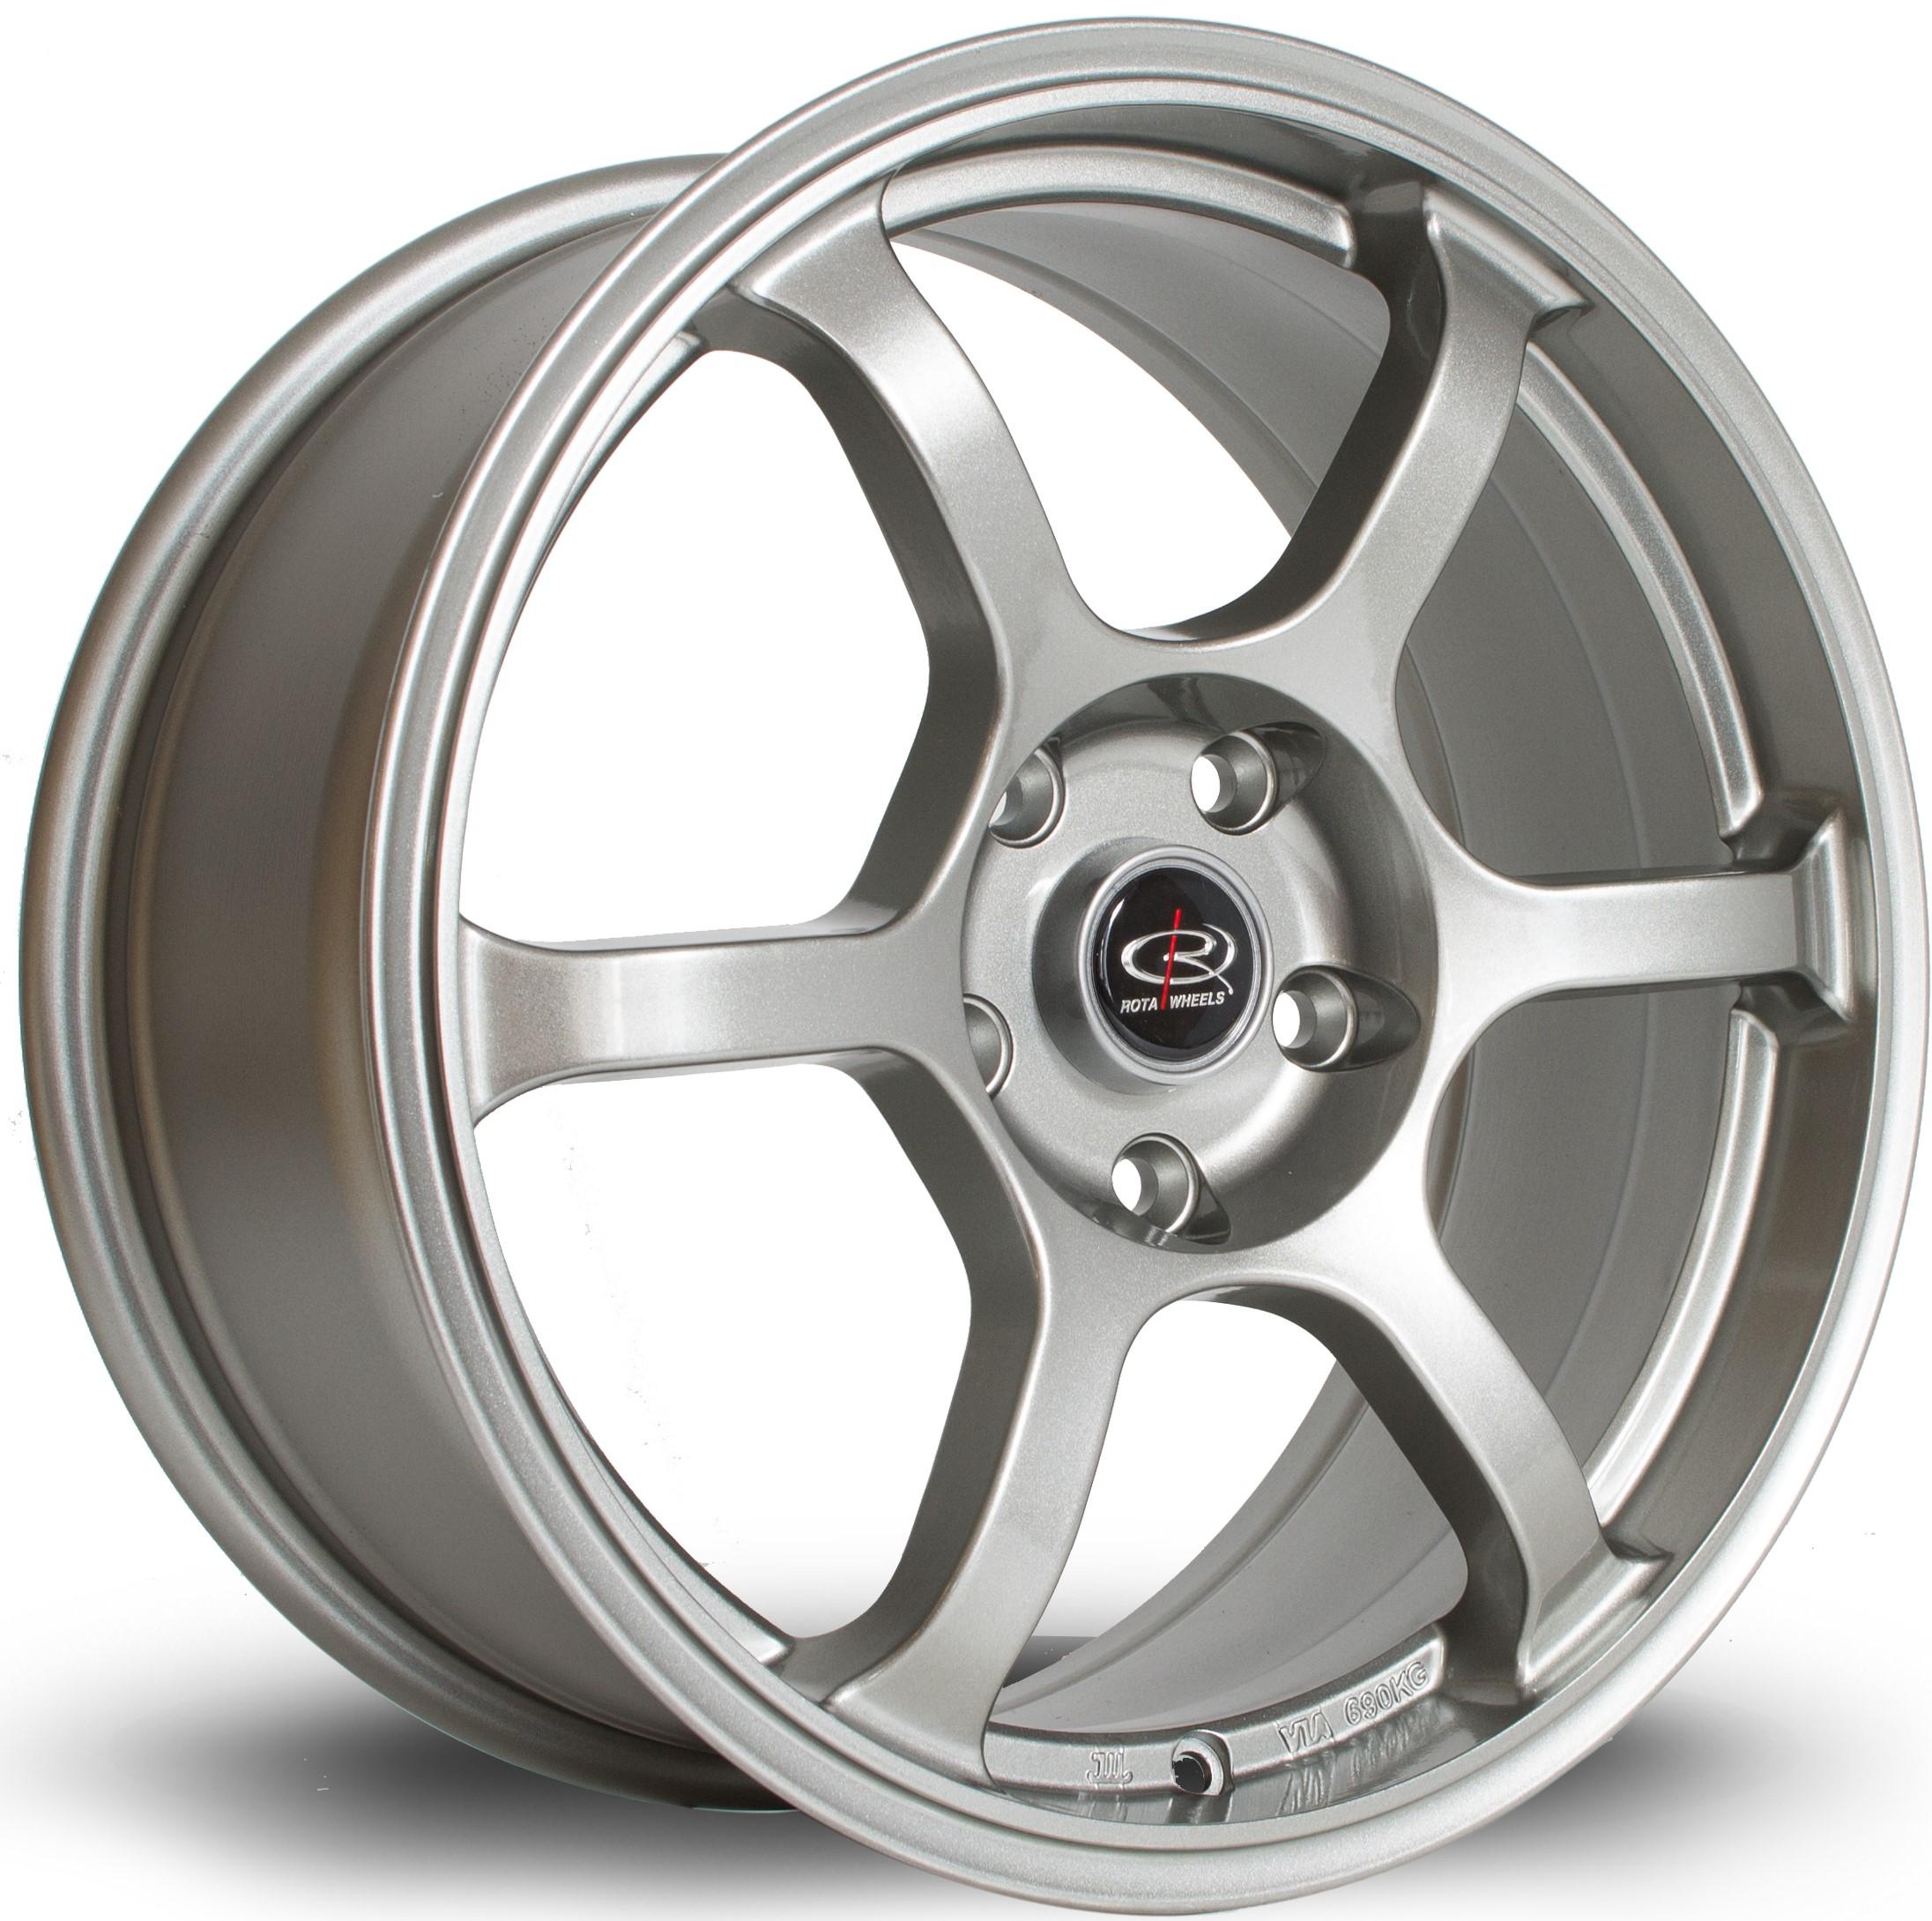 Rota - Boost (Steel Grey)